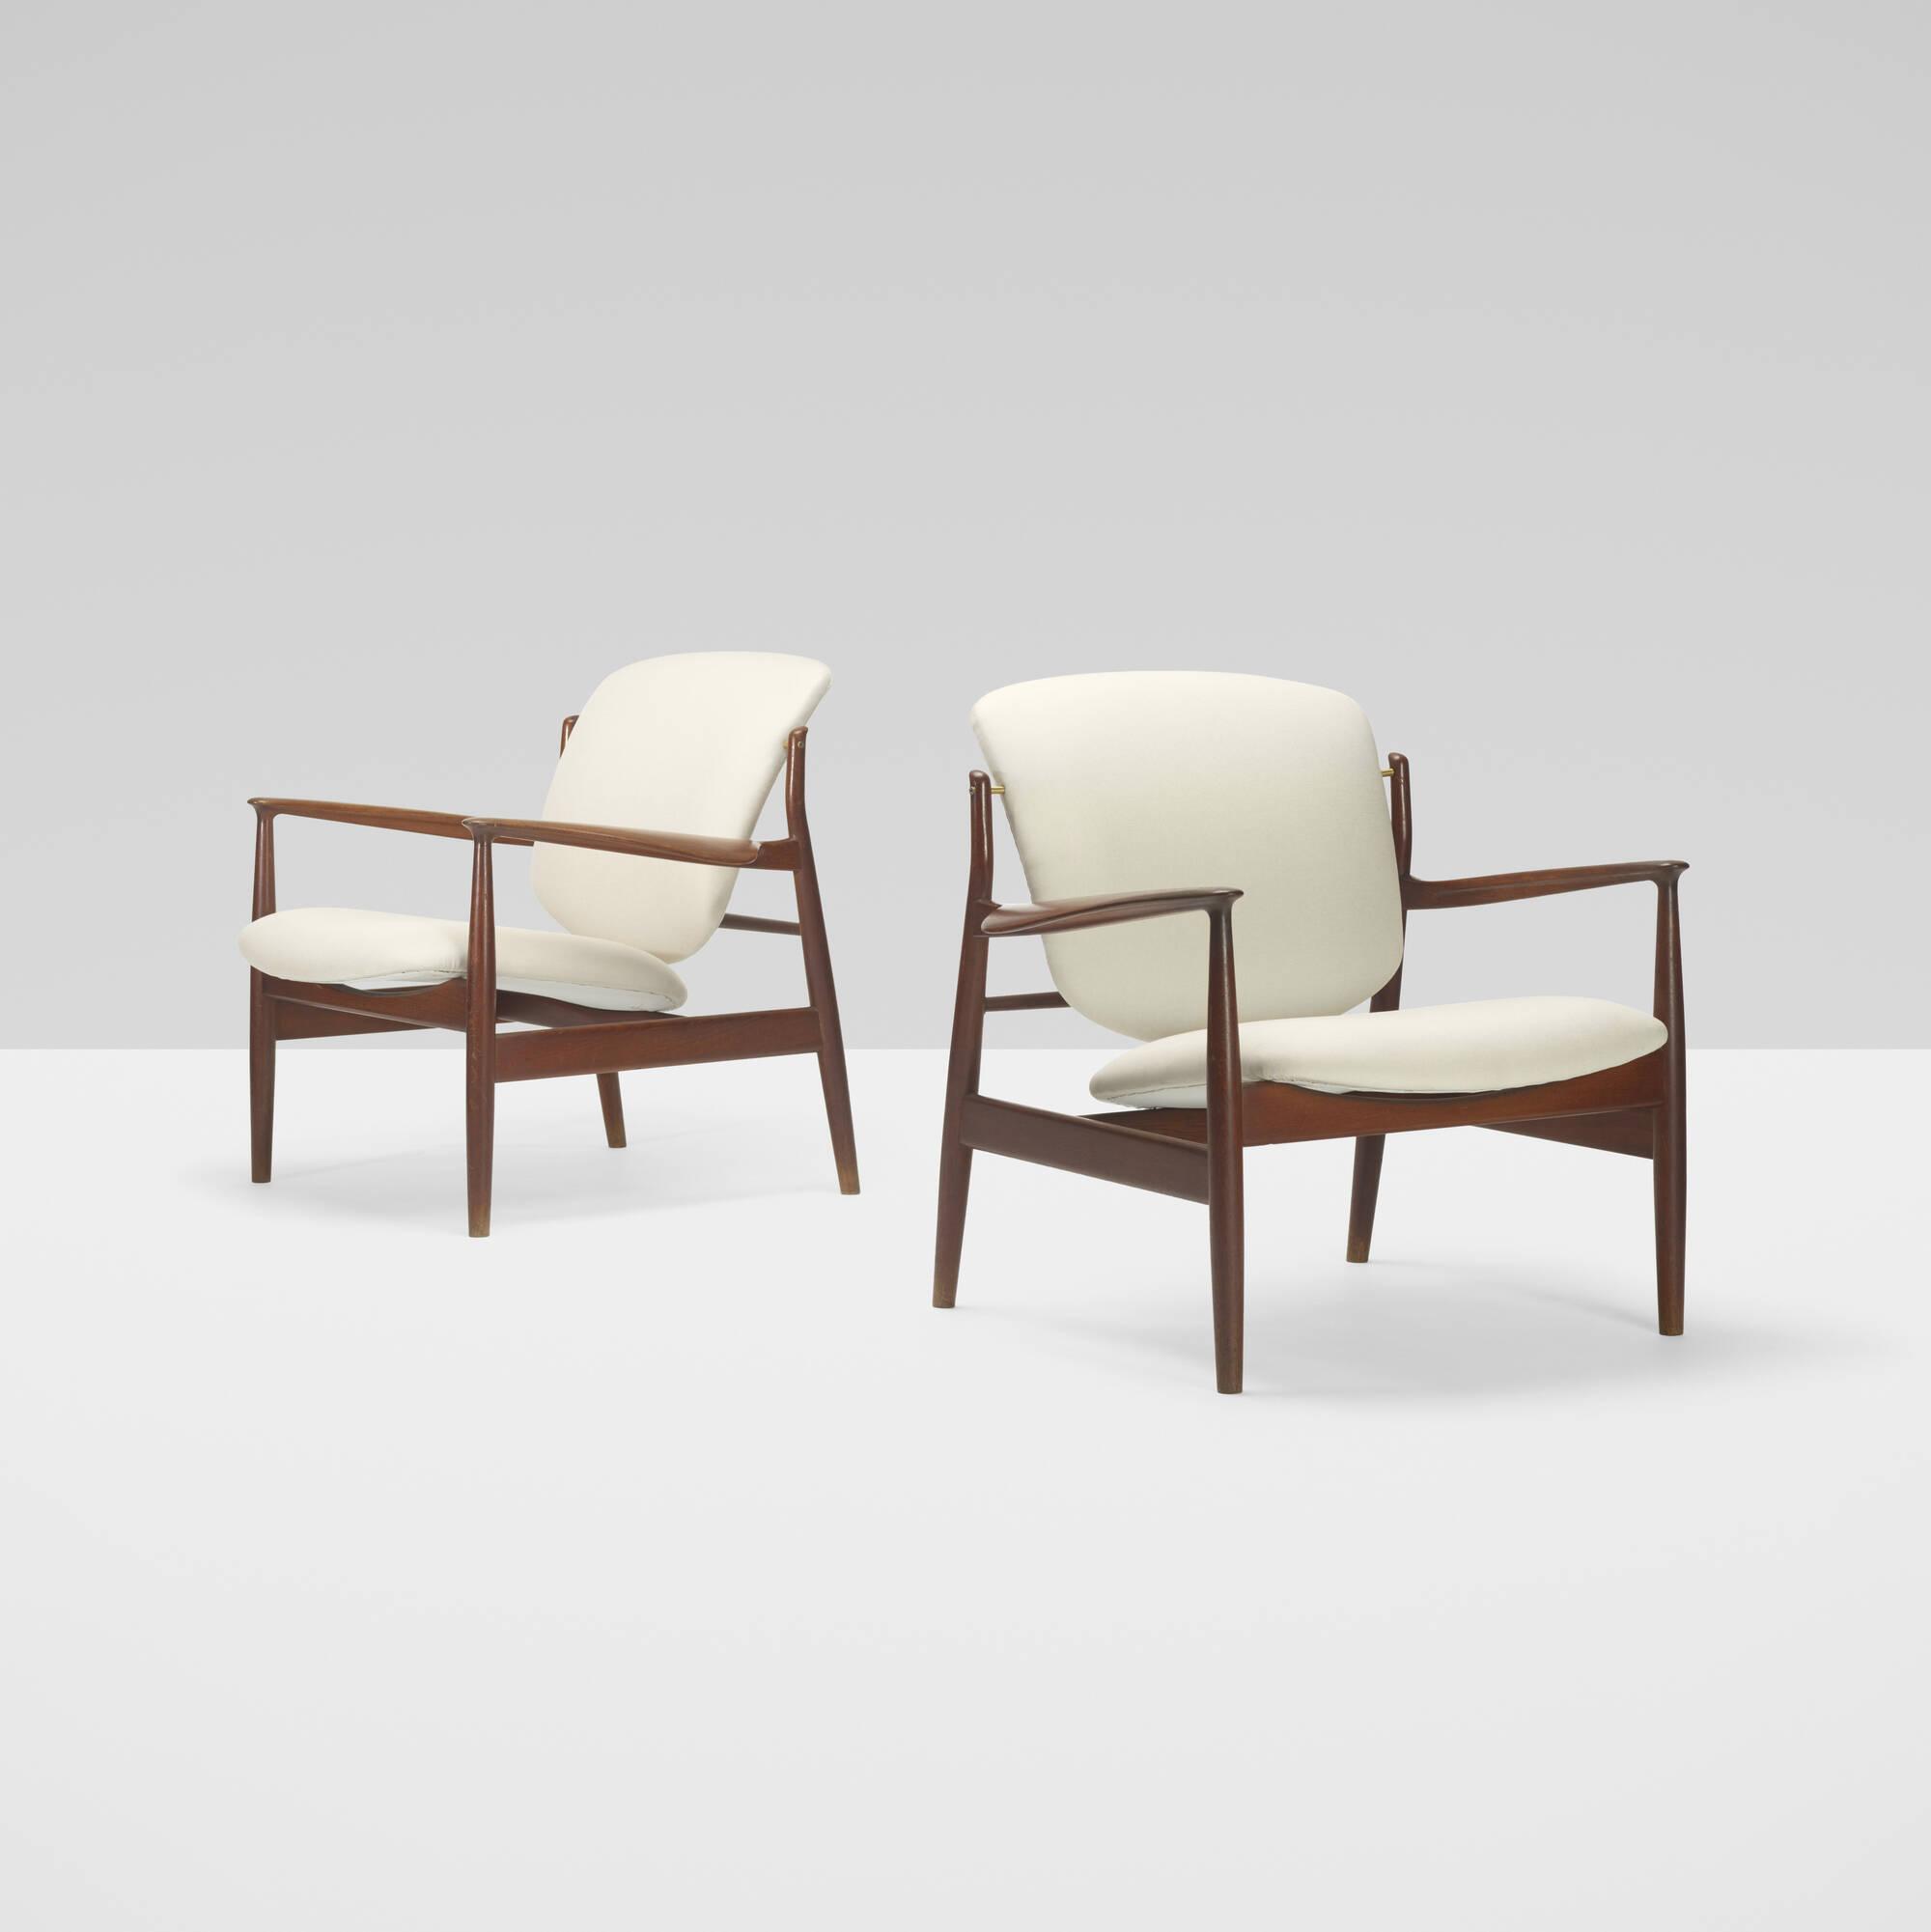 161: Finn Juhl / lounge chairs, pair (1 of 3)